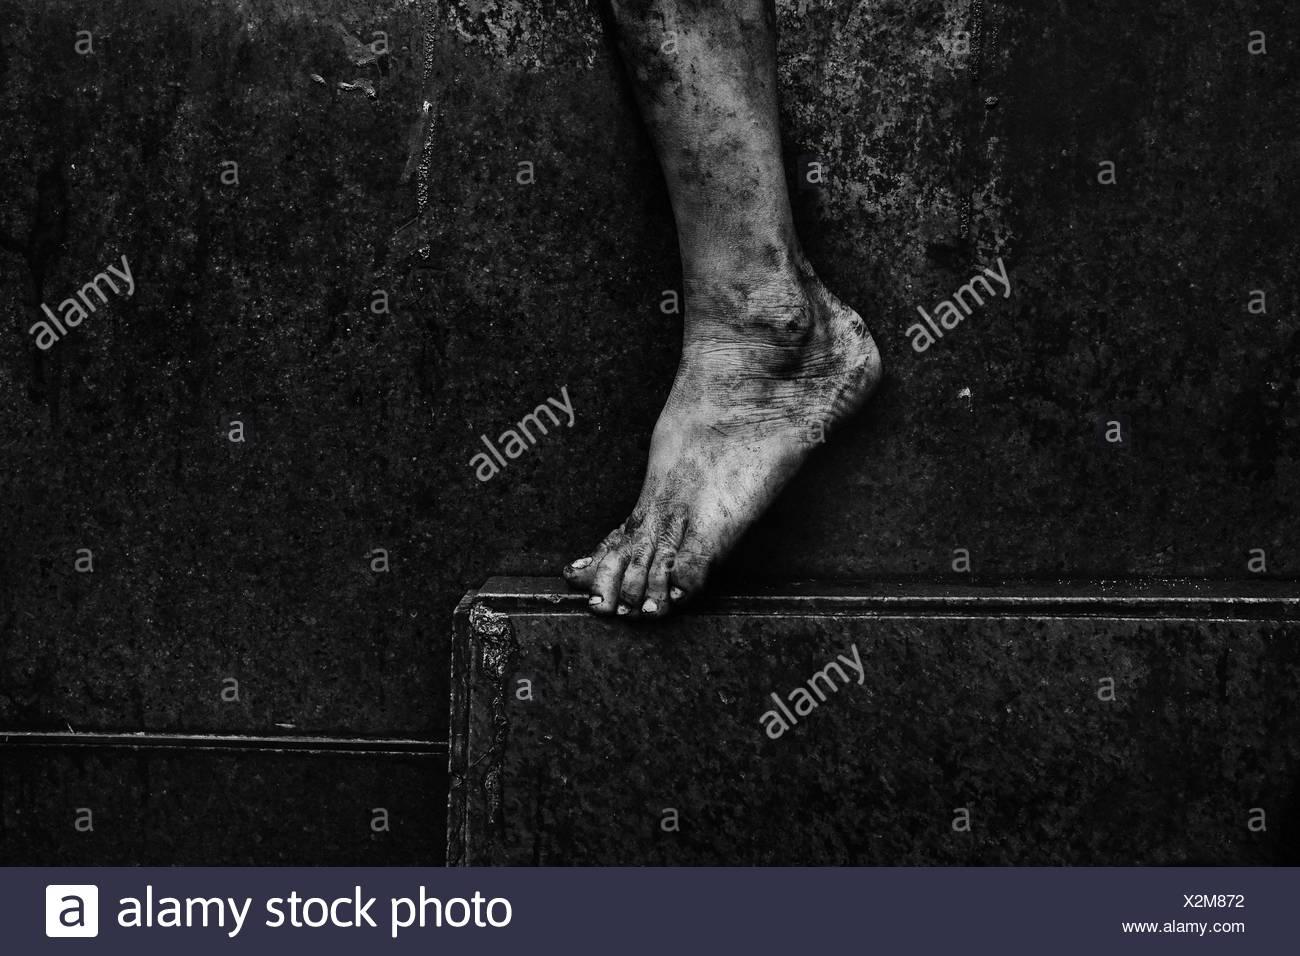 Sezione bassa di a piedi nudi Immagini Stock